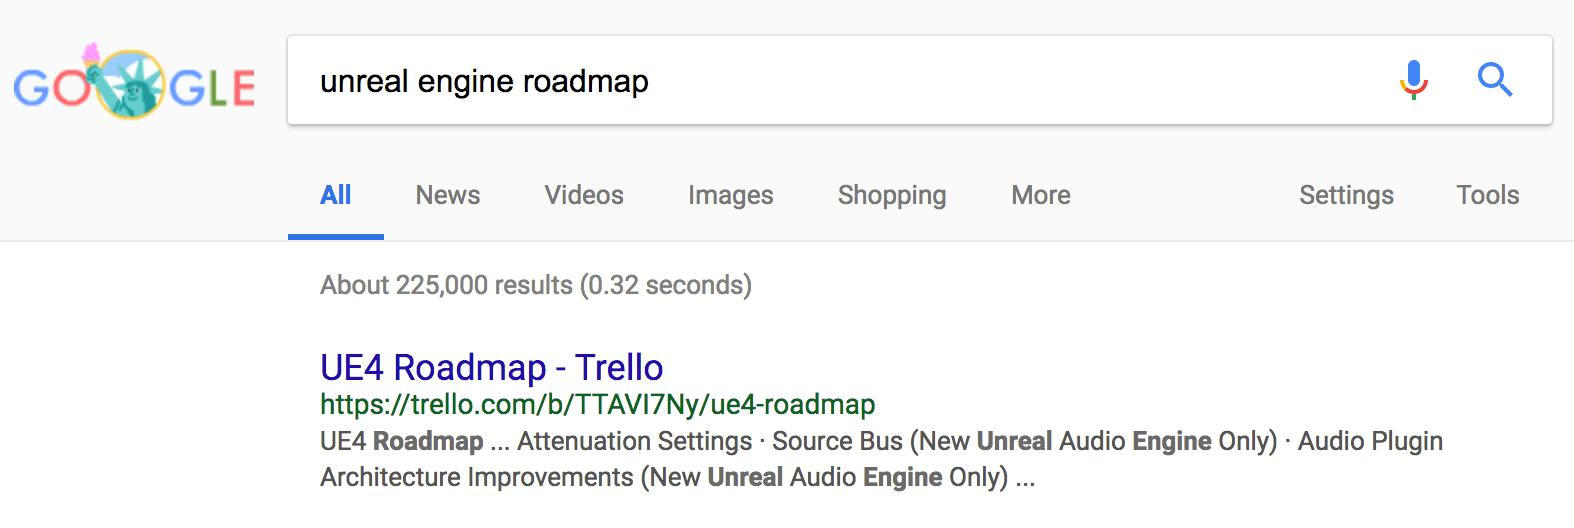 unreal engine roadmap SEO rank